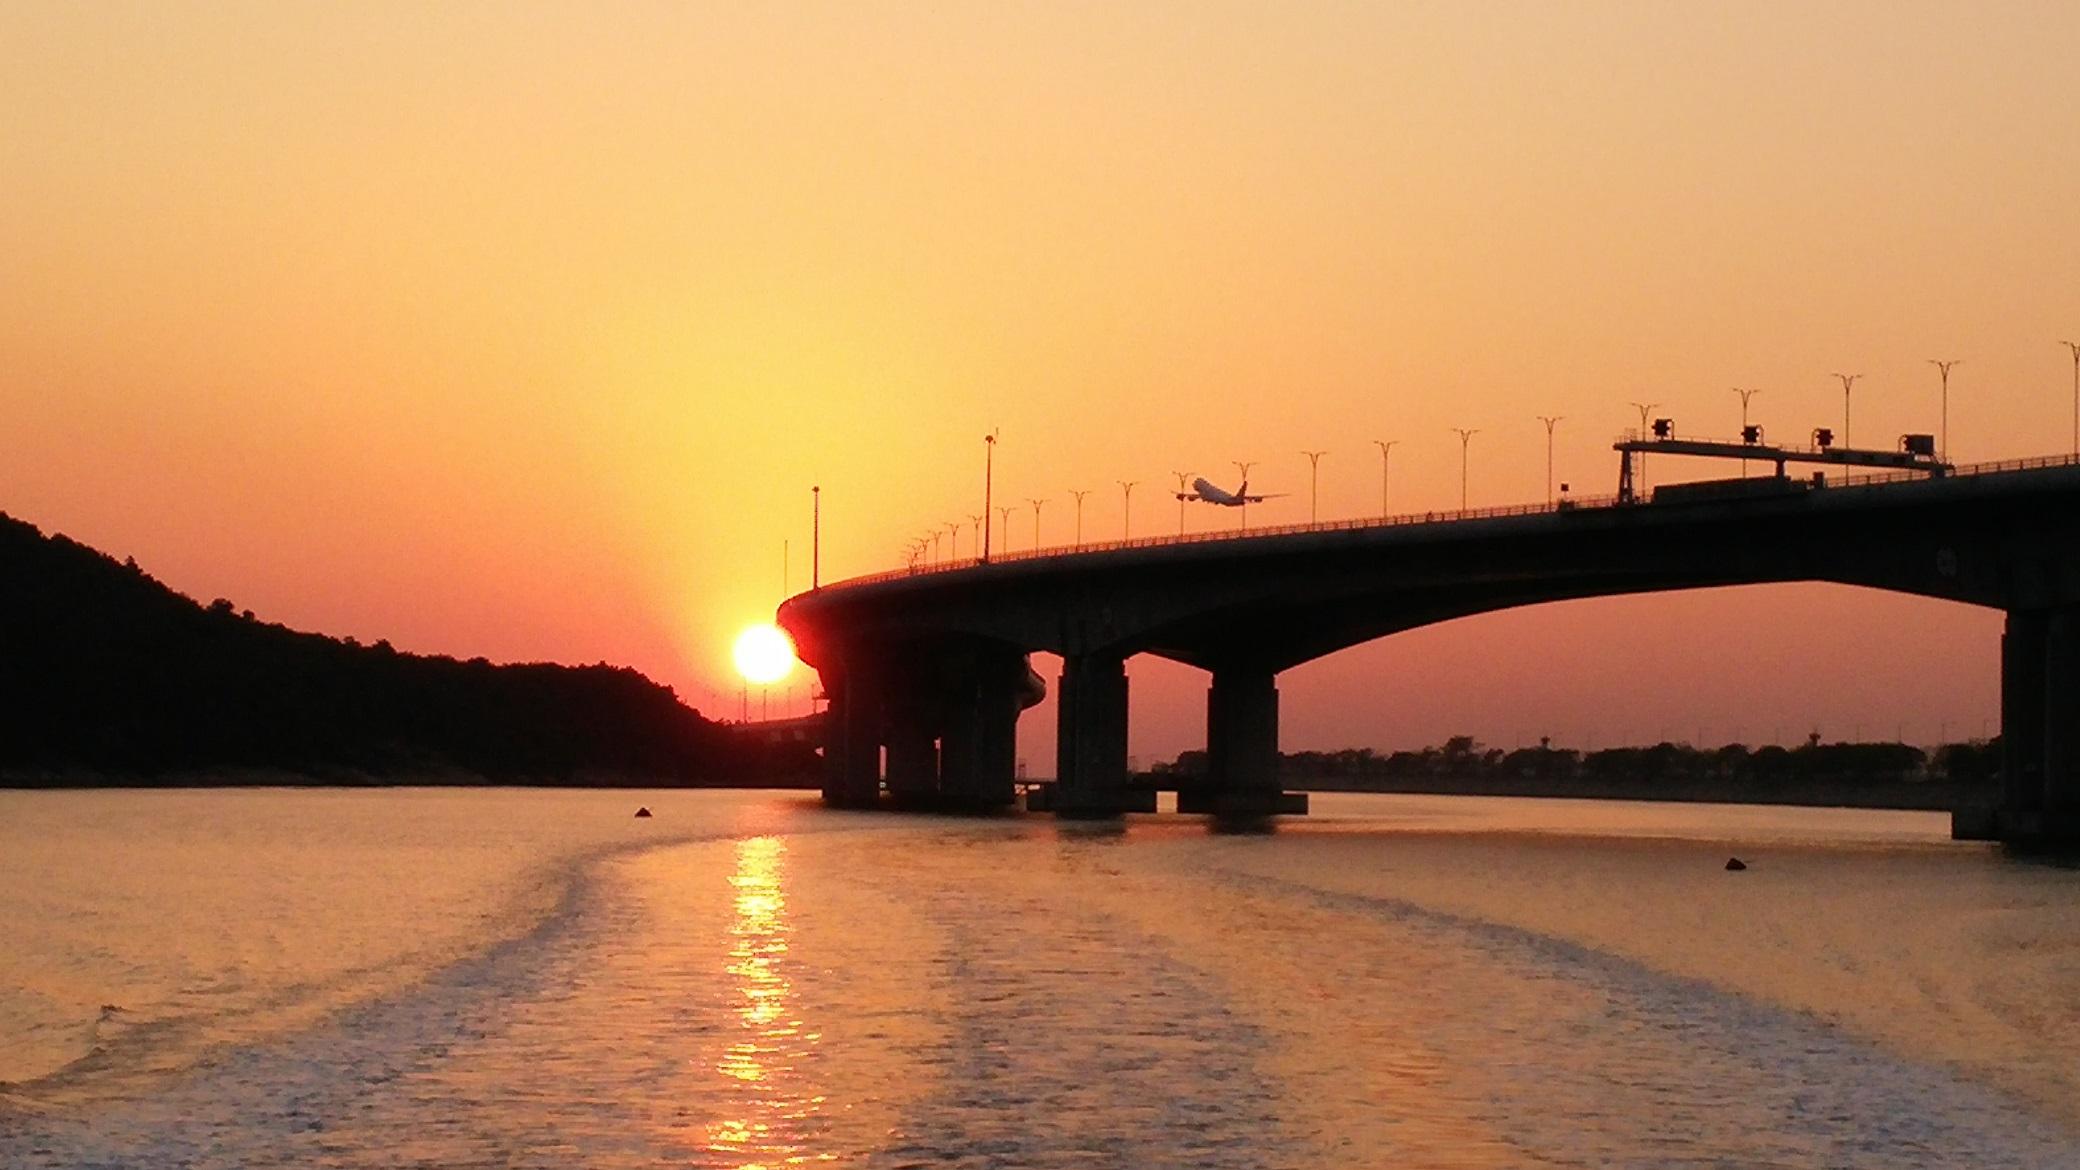 See nice sunset at Tai O to Tung Chung Ferry